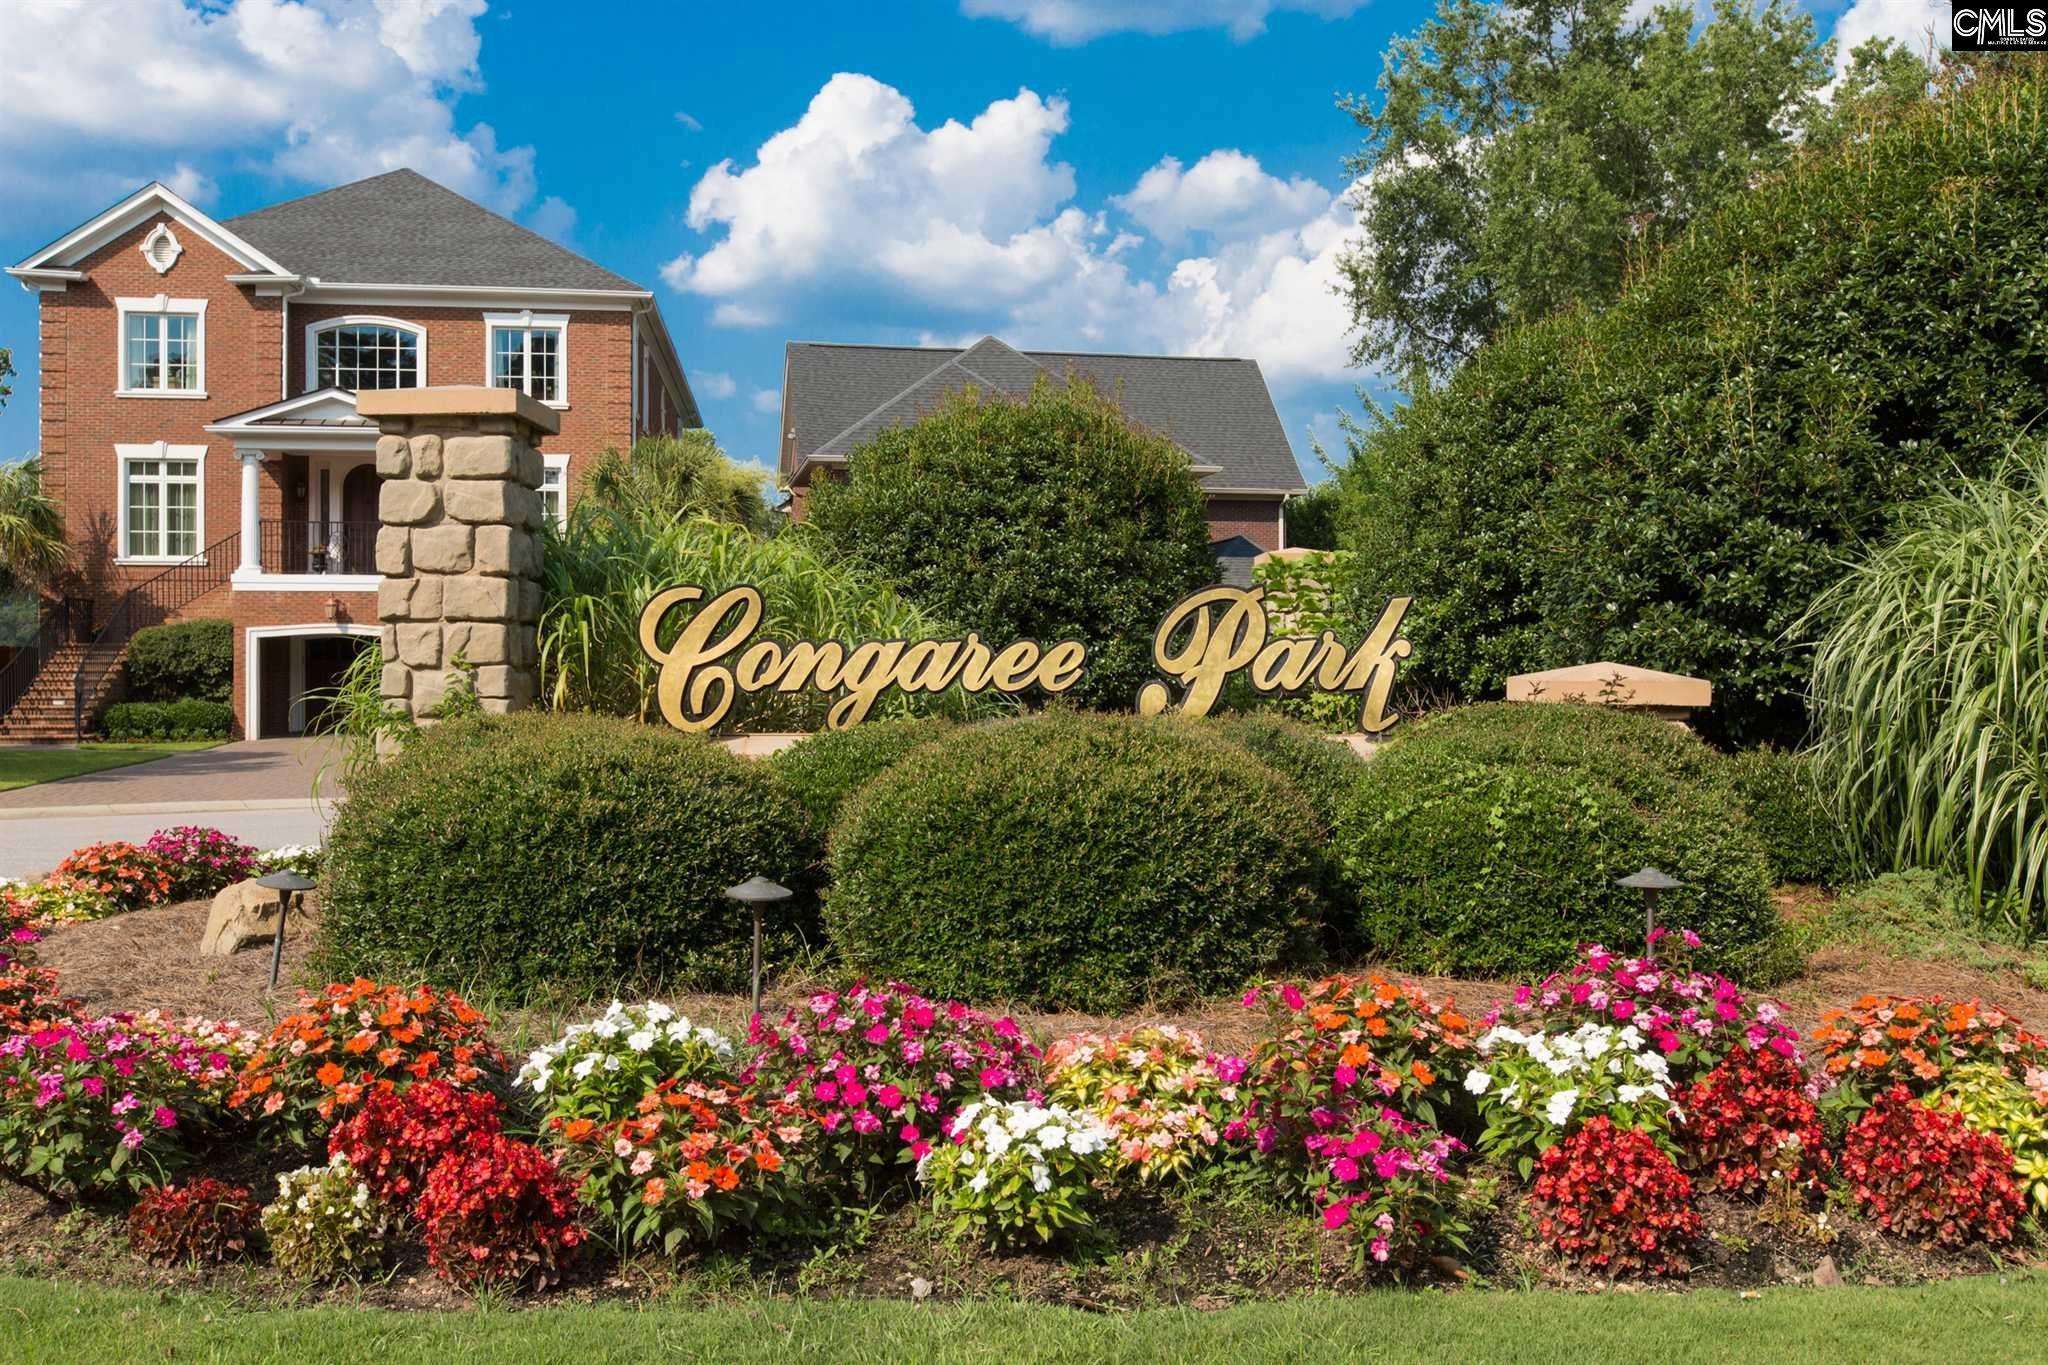 189 Congaree Park West Columbia, SC 29169